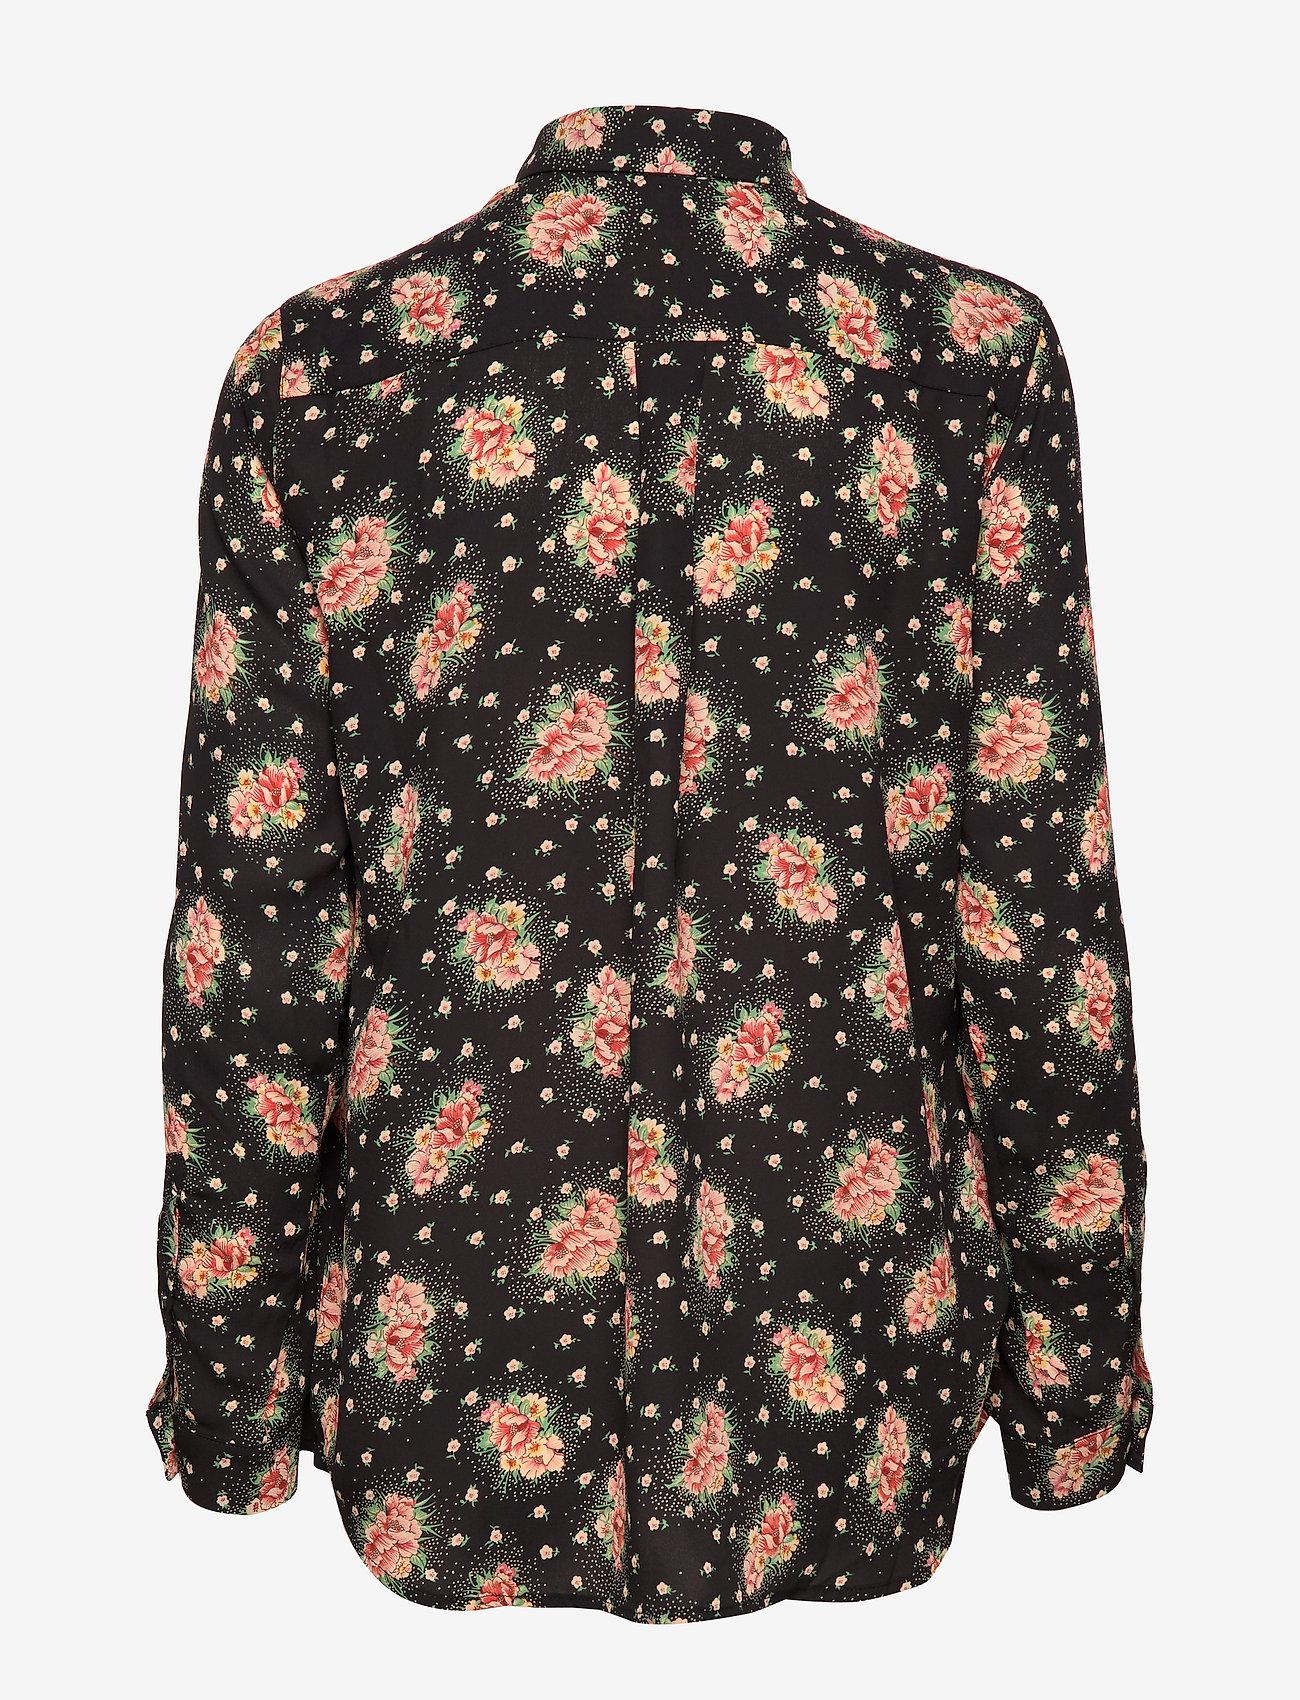 Whyred - KAROLINA BLOSSOMY - chemises à manches longues - black - 1